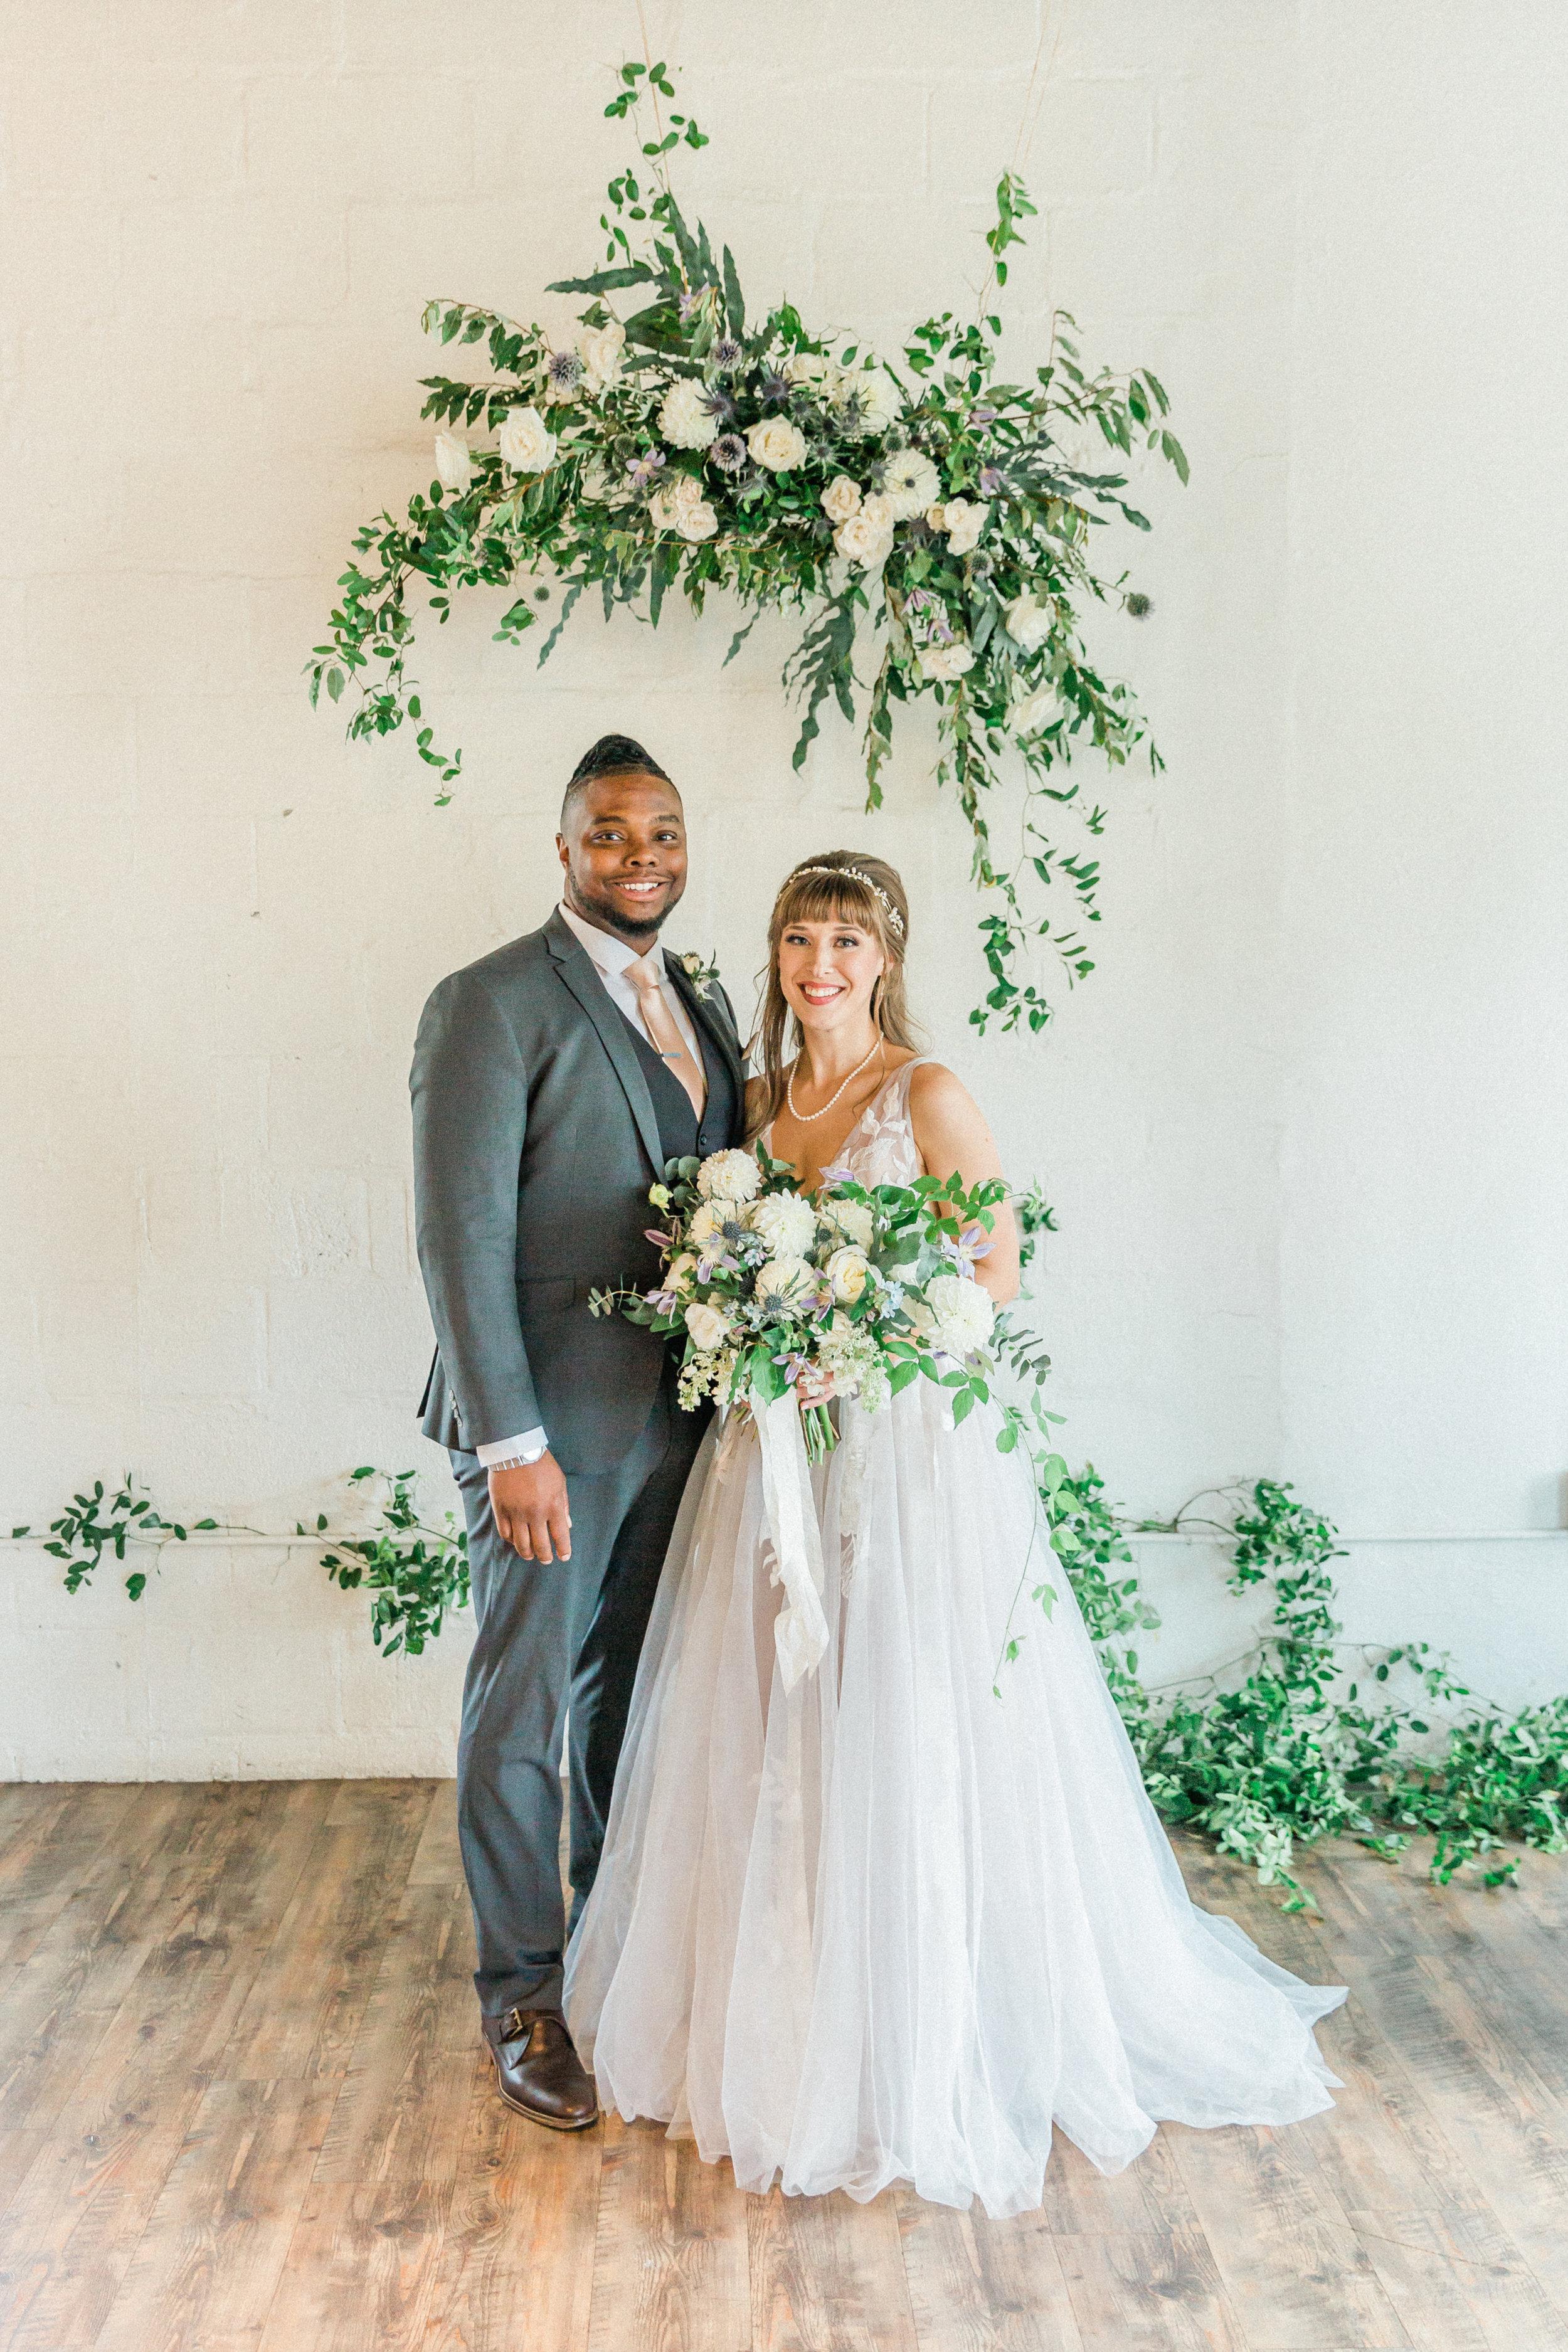 Mallory and Aaron - Married - Sneaks - Lauren Alisse Photography-50.jpg